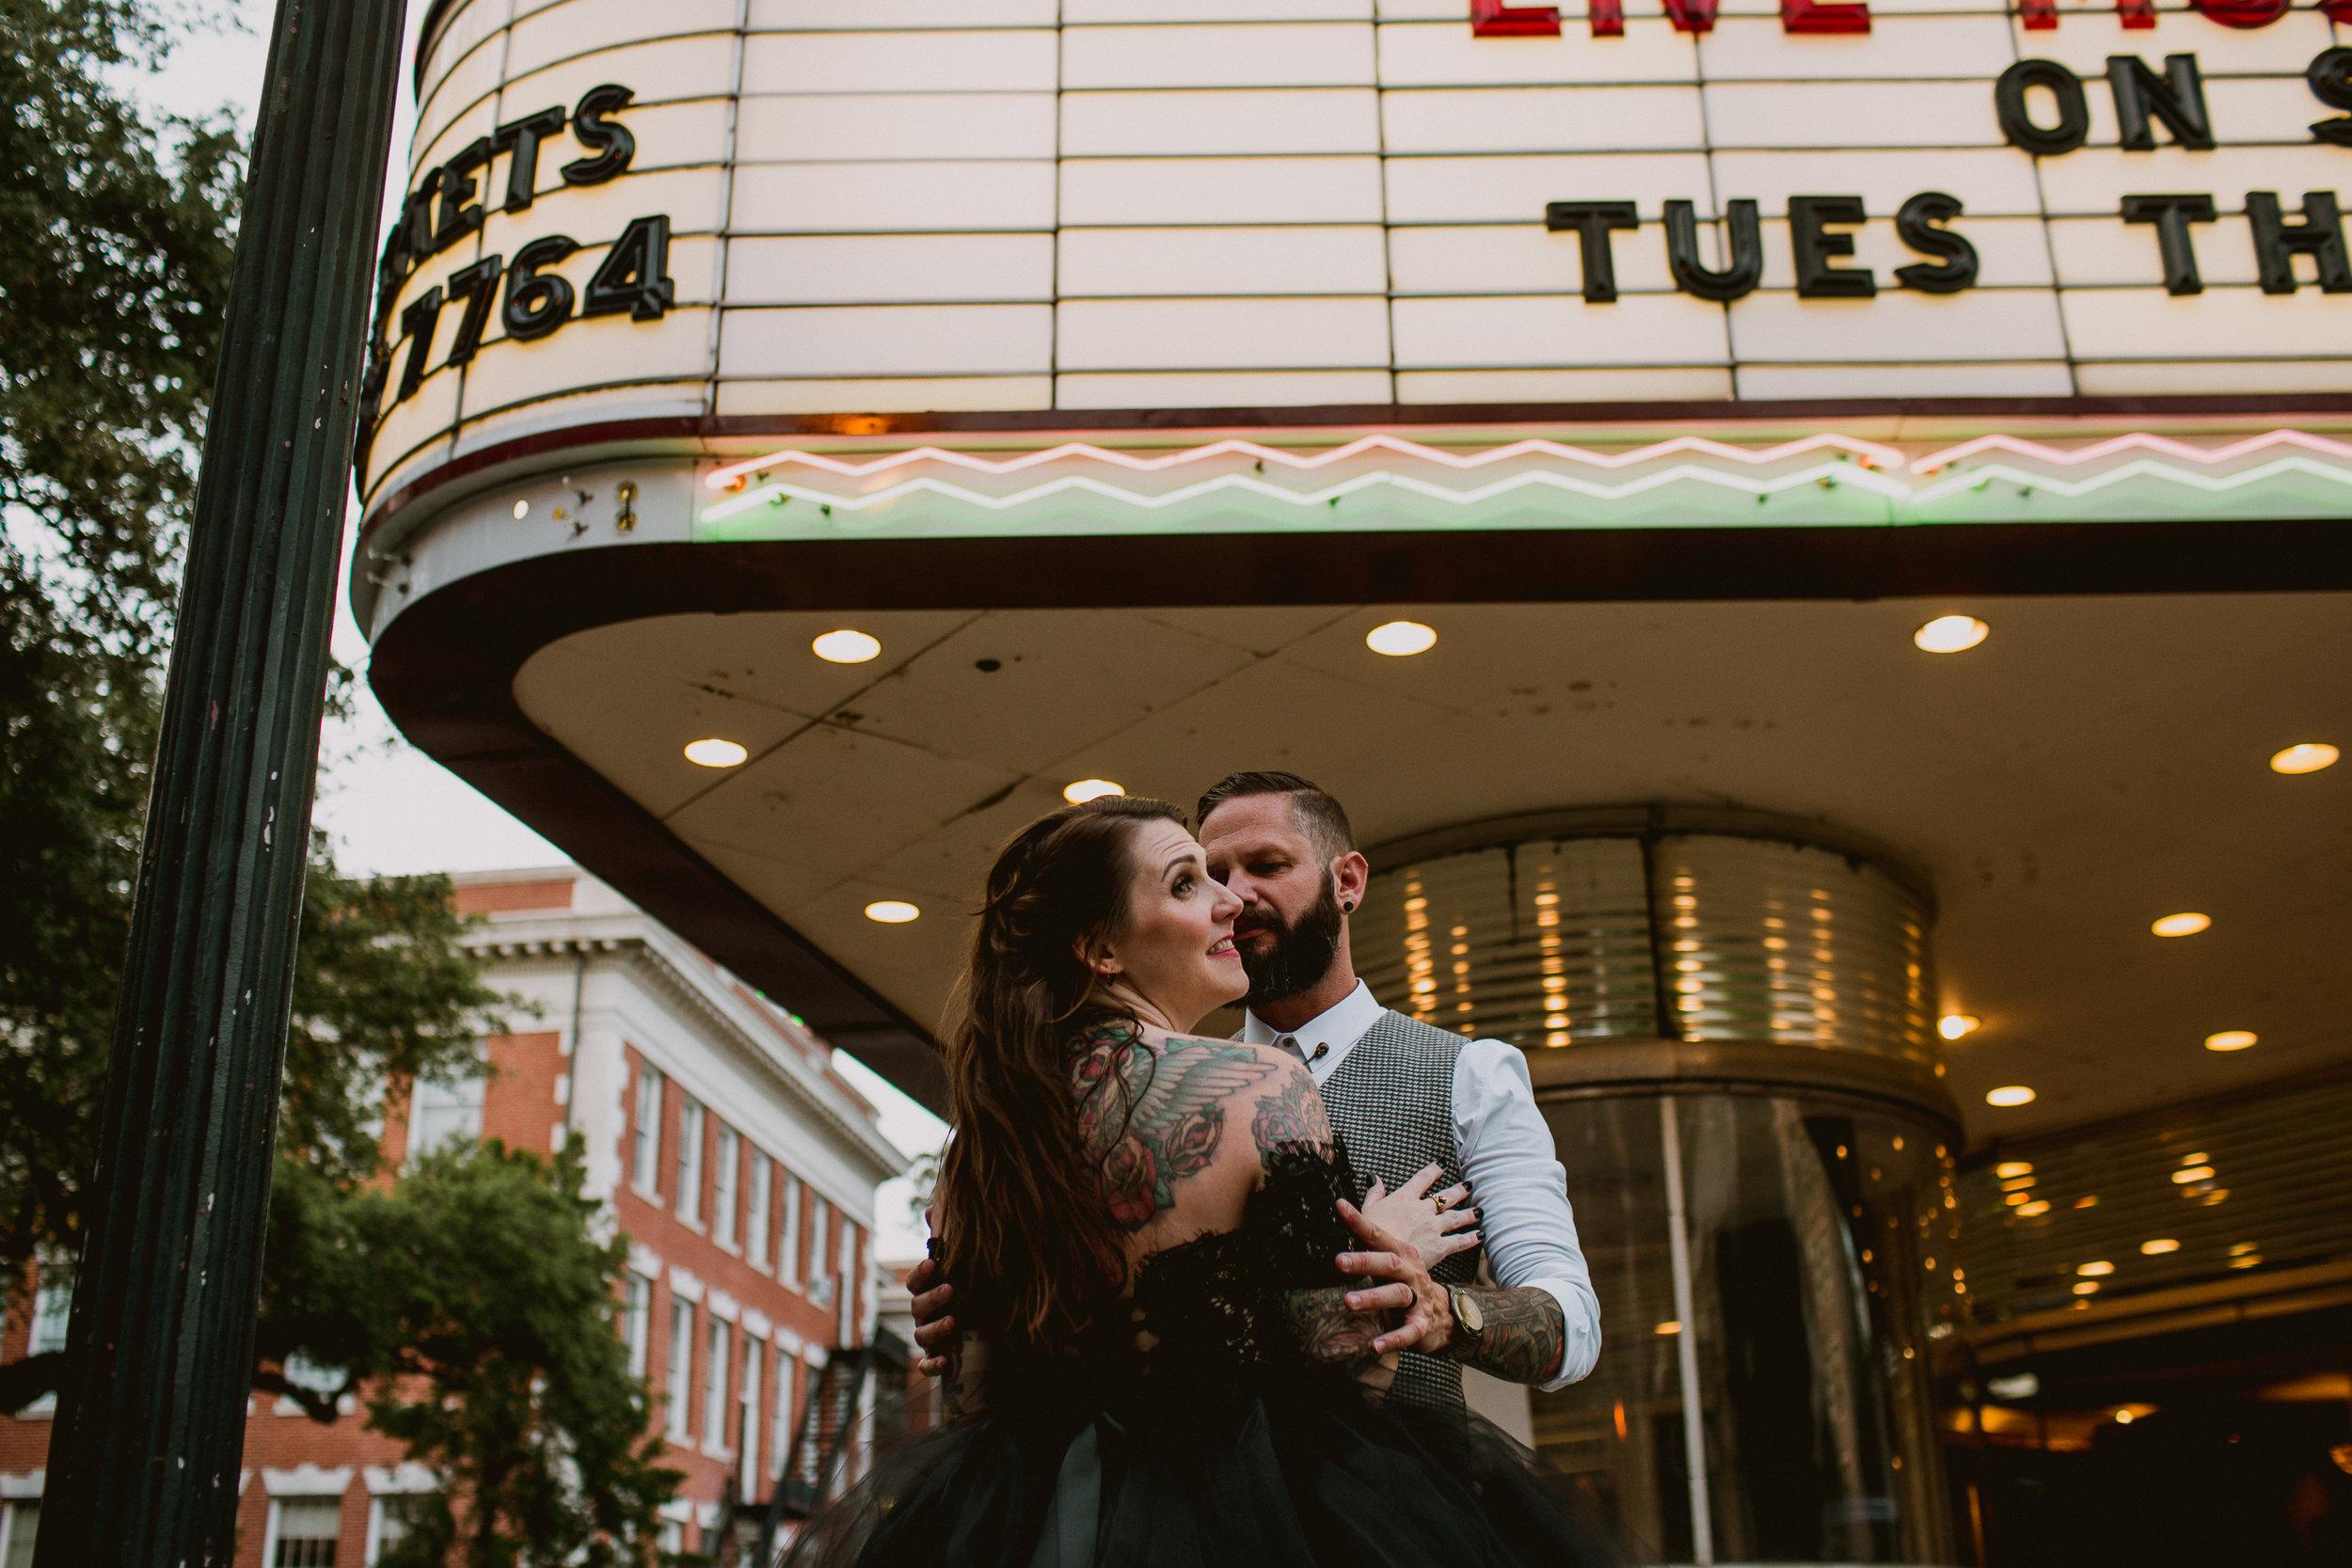 bohemian-hotel-savannah-elopement-kelley-raye-atlanta-wedding-photographer-151.jpg